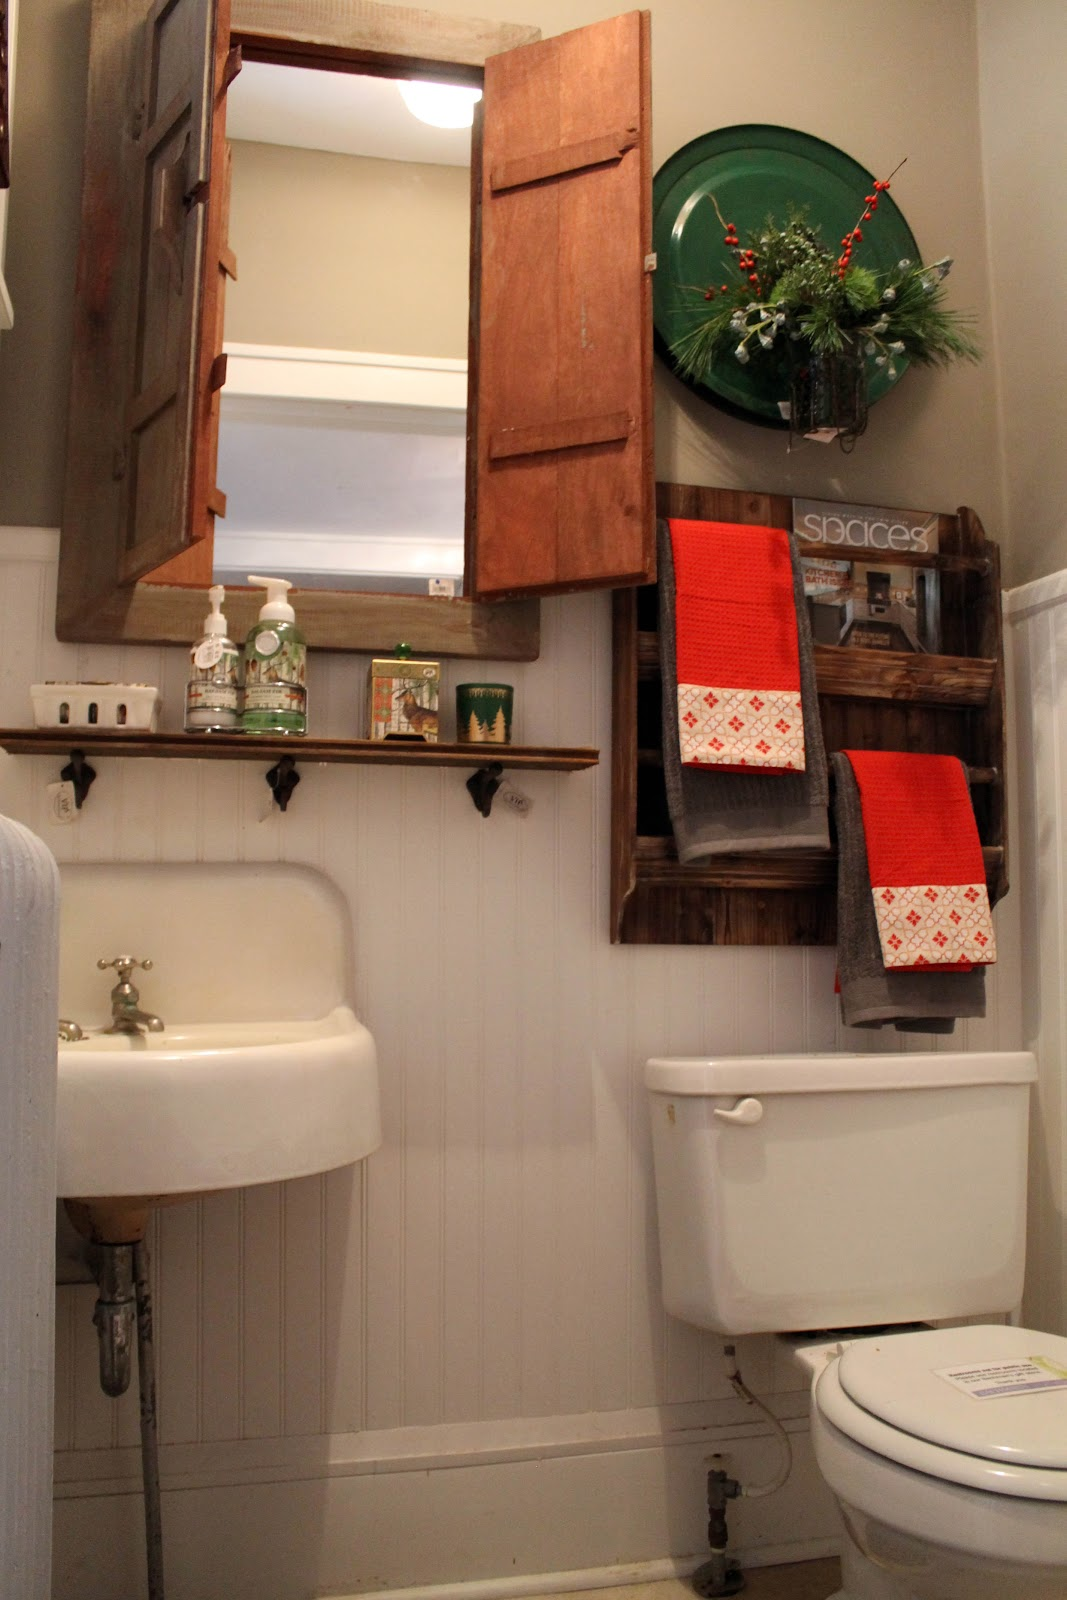 Stunning Bathroom Toilet Paper Holder with Magazine Racks 1067 x 1600 · 200 kB · jpeg